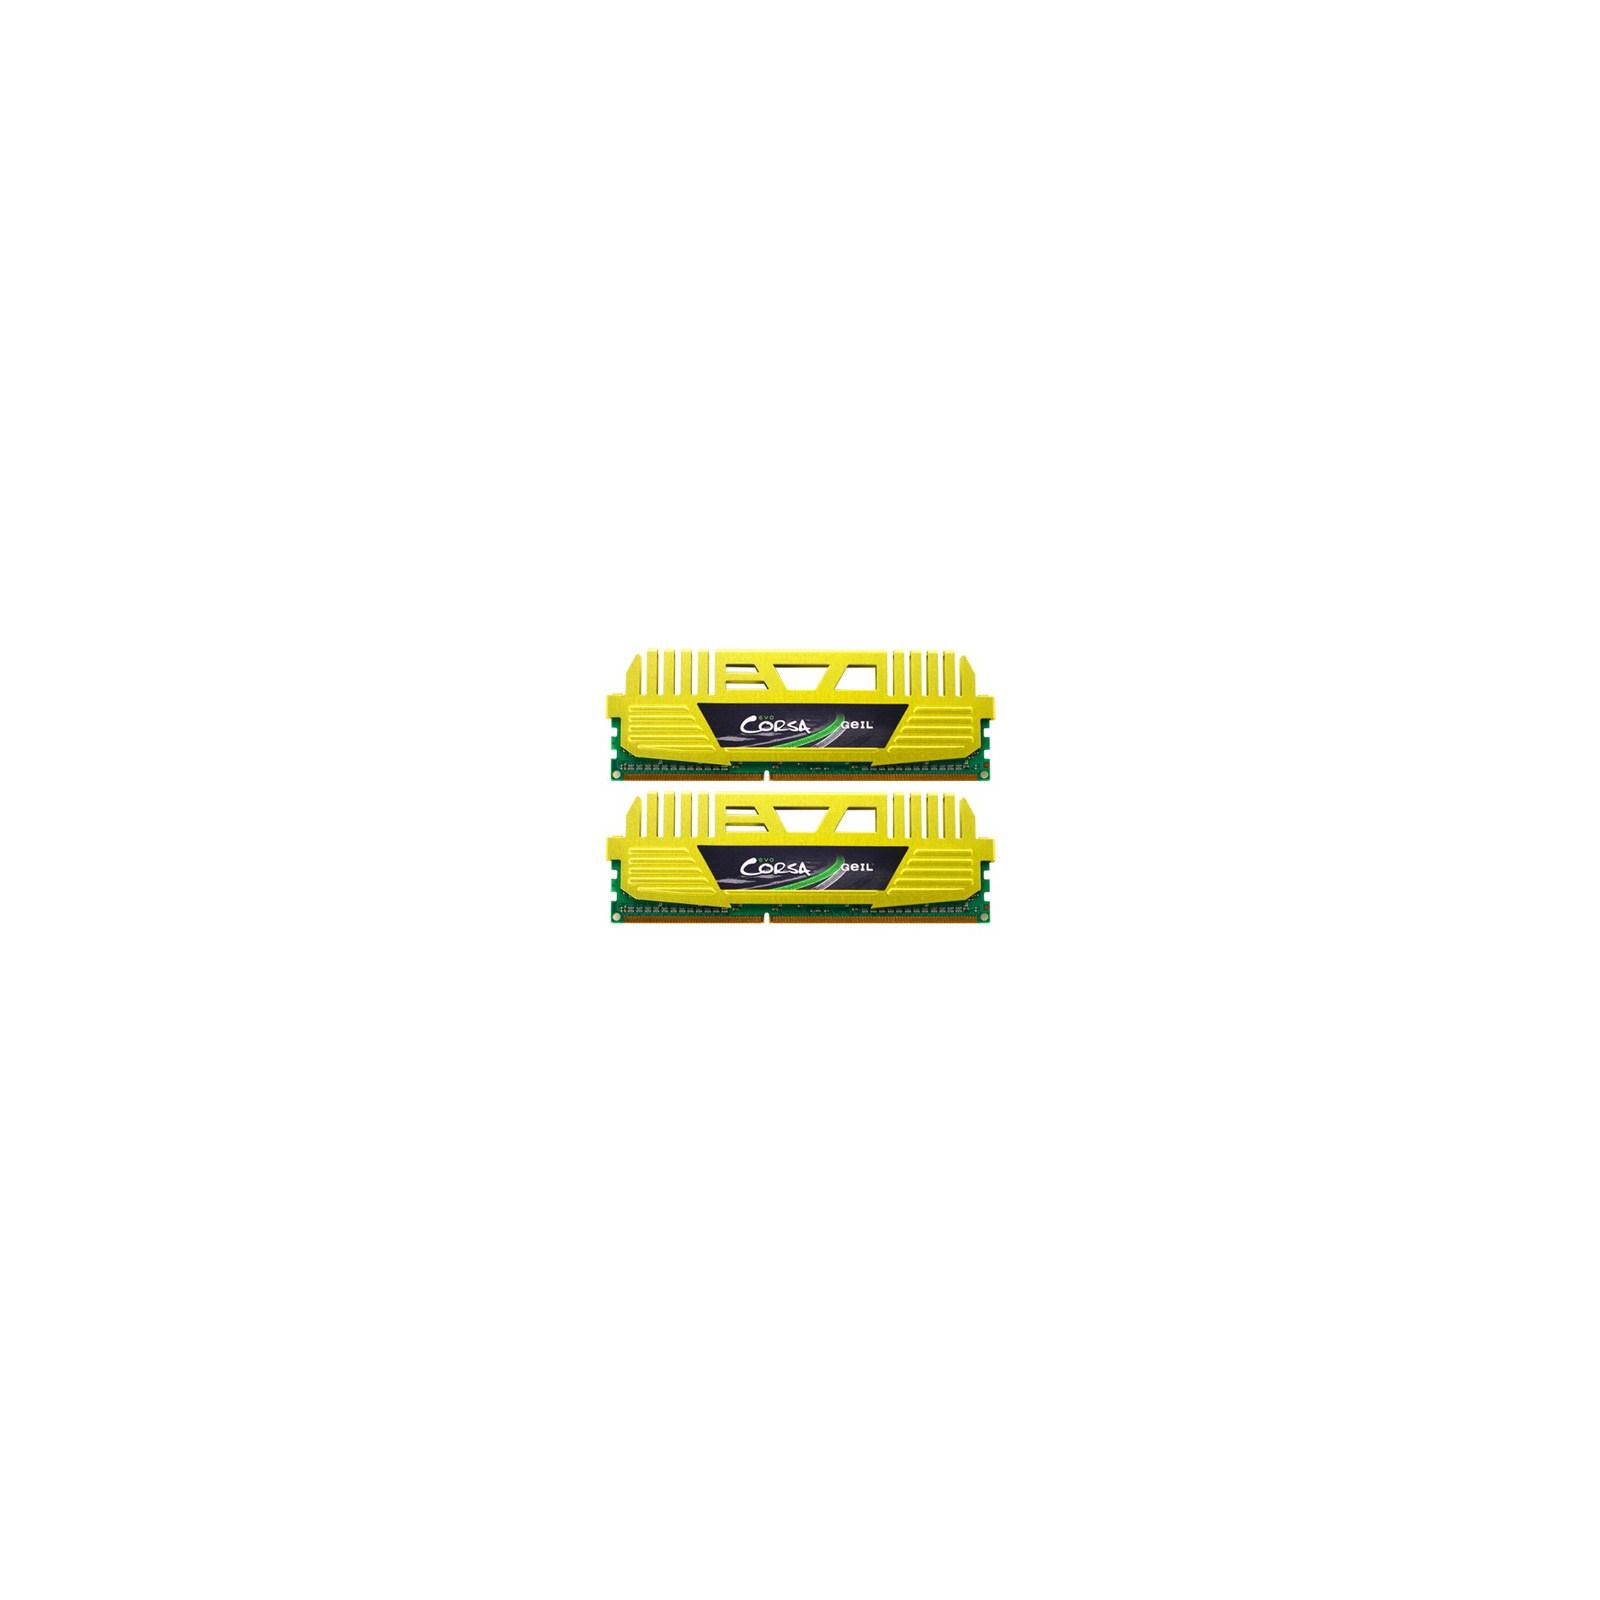 Модуль памяти для компьютера DDR3 16GB (2x8GB) 1600 MHz GEIL (GOC316GB1600C10DC)